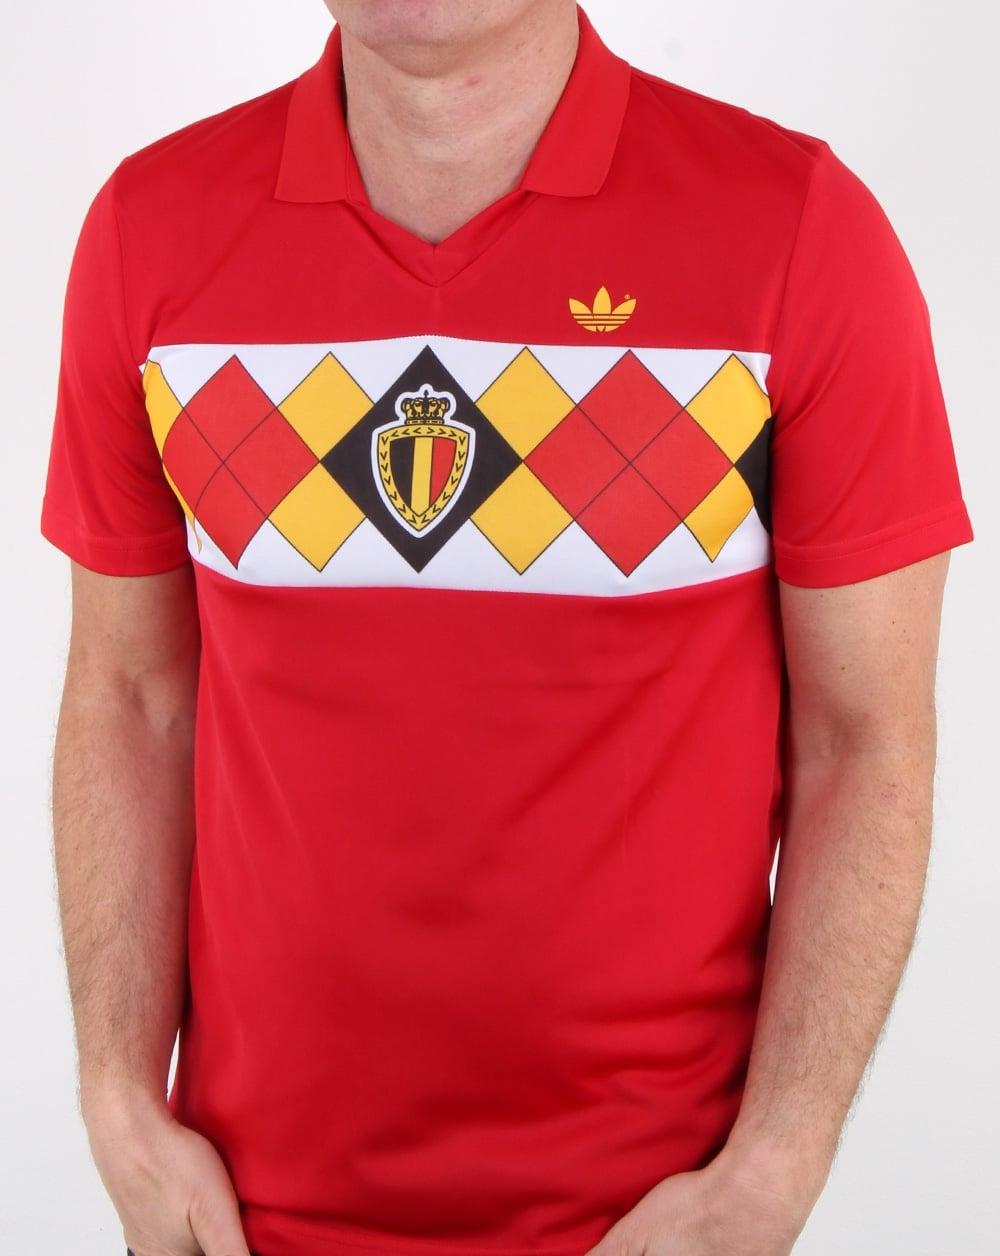 c9317f3e8 adidas Originals Adidas Originals Old Skool Belgium Jersey Victory Red